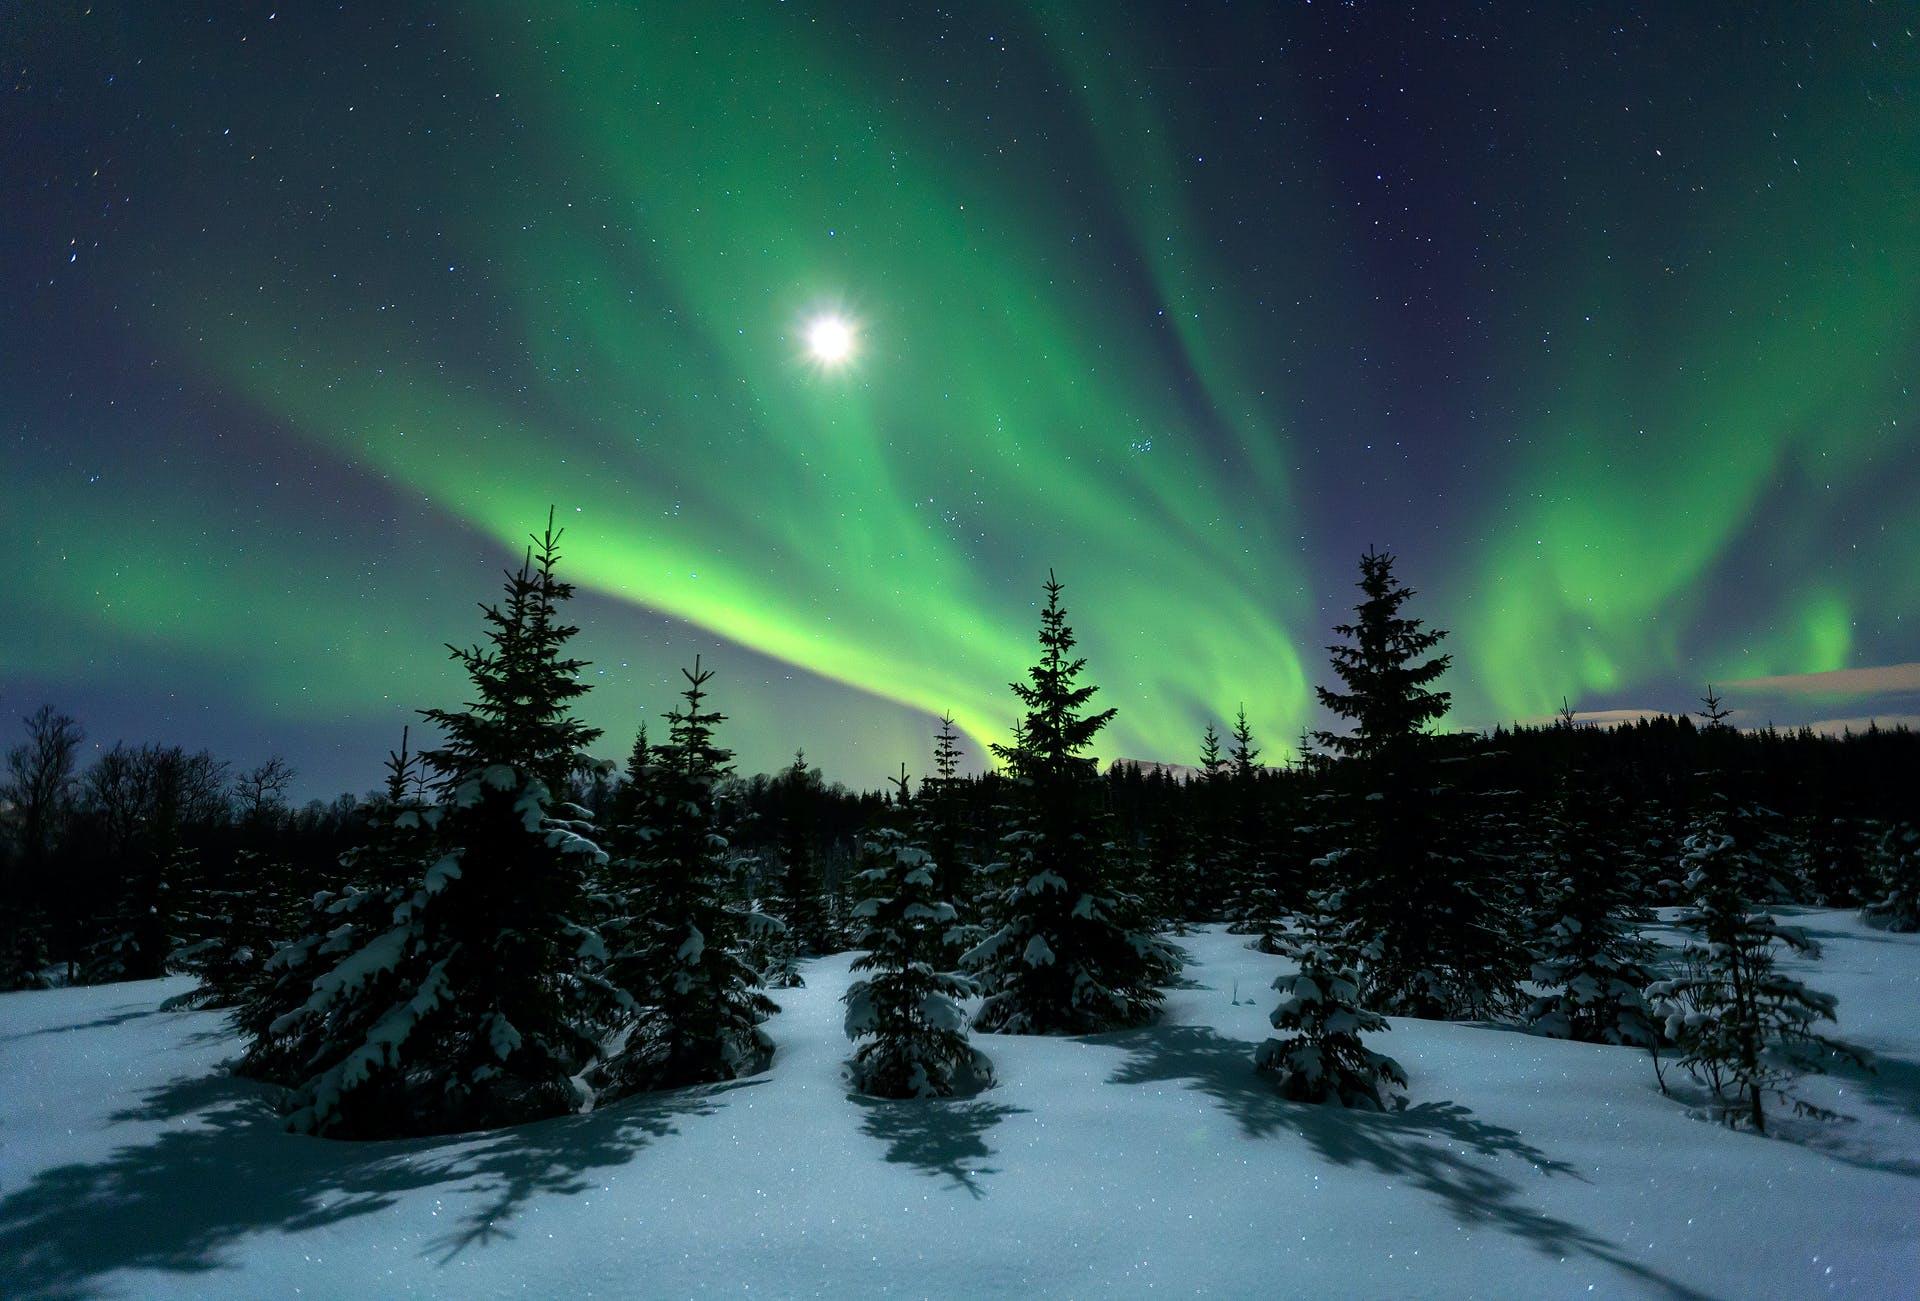 Winter_night_hires.jpg